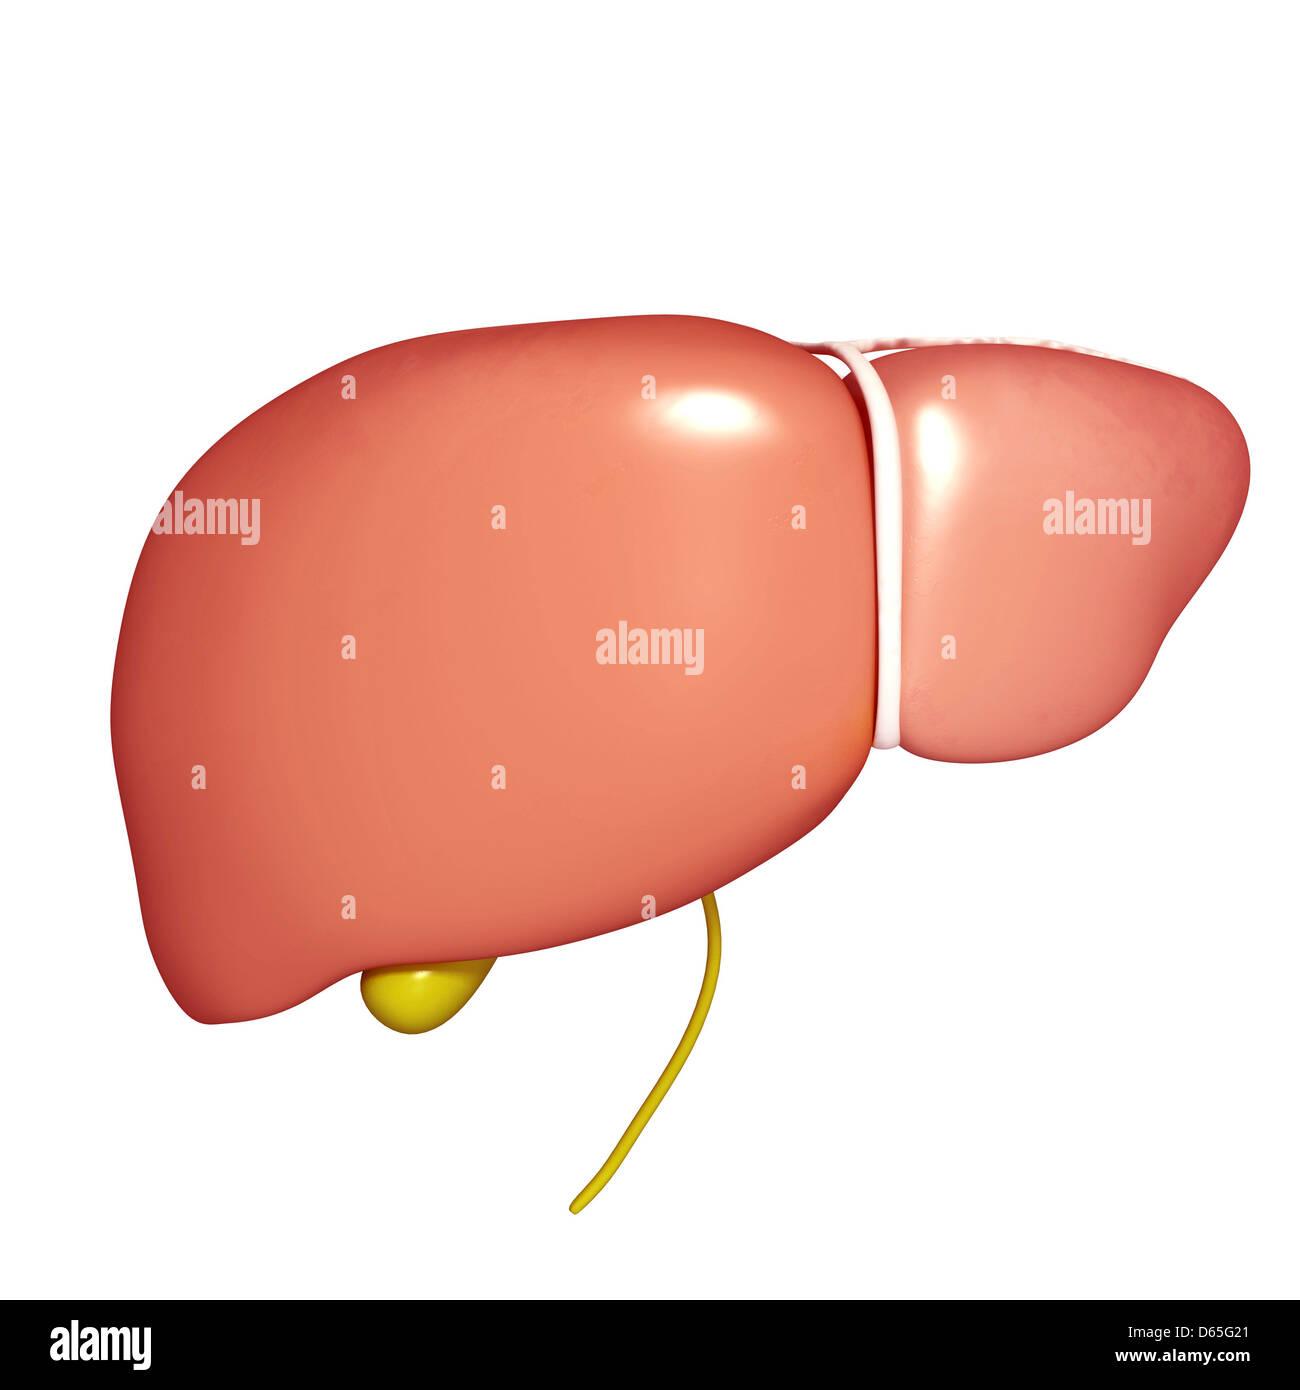 Liver And Gallbladder Stock Photos Liver And Gallbladder Stock